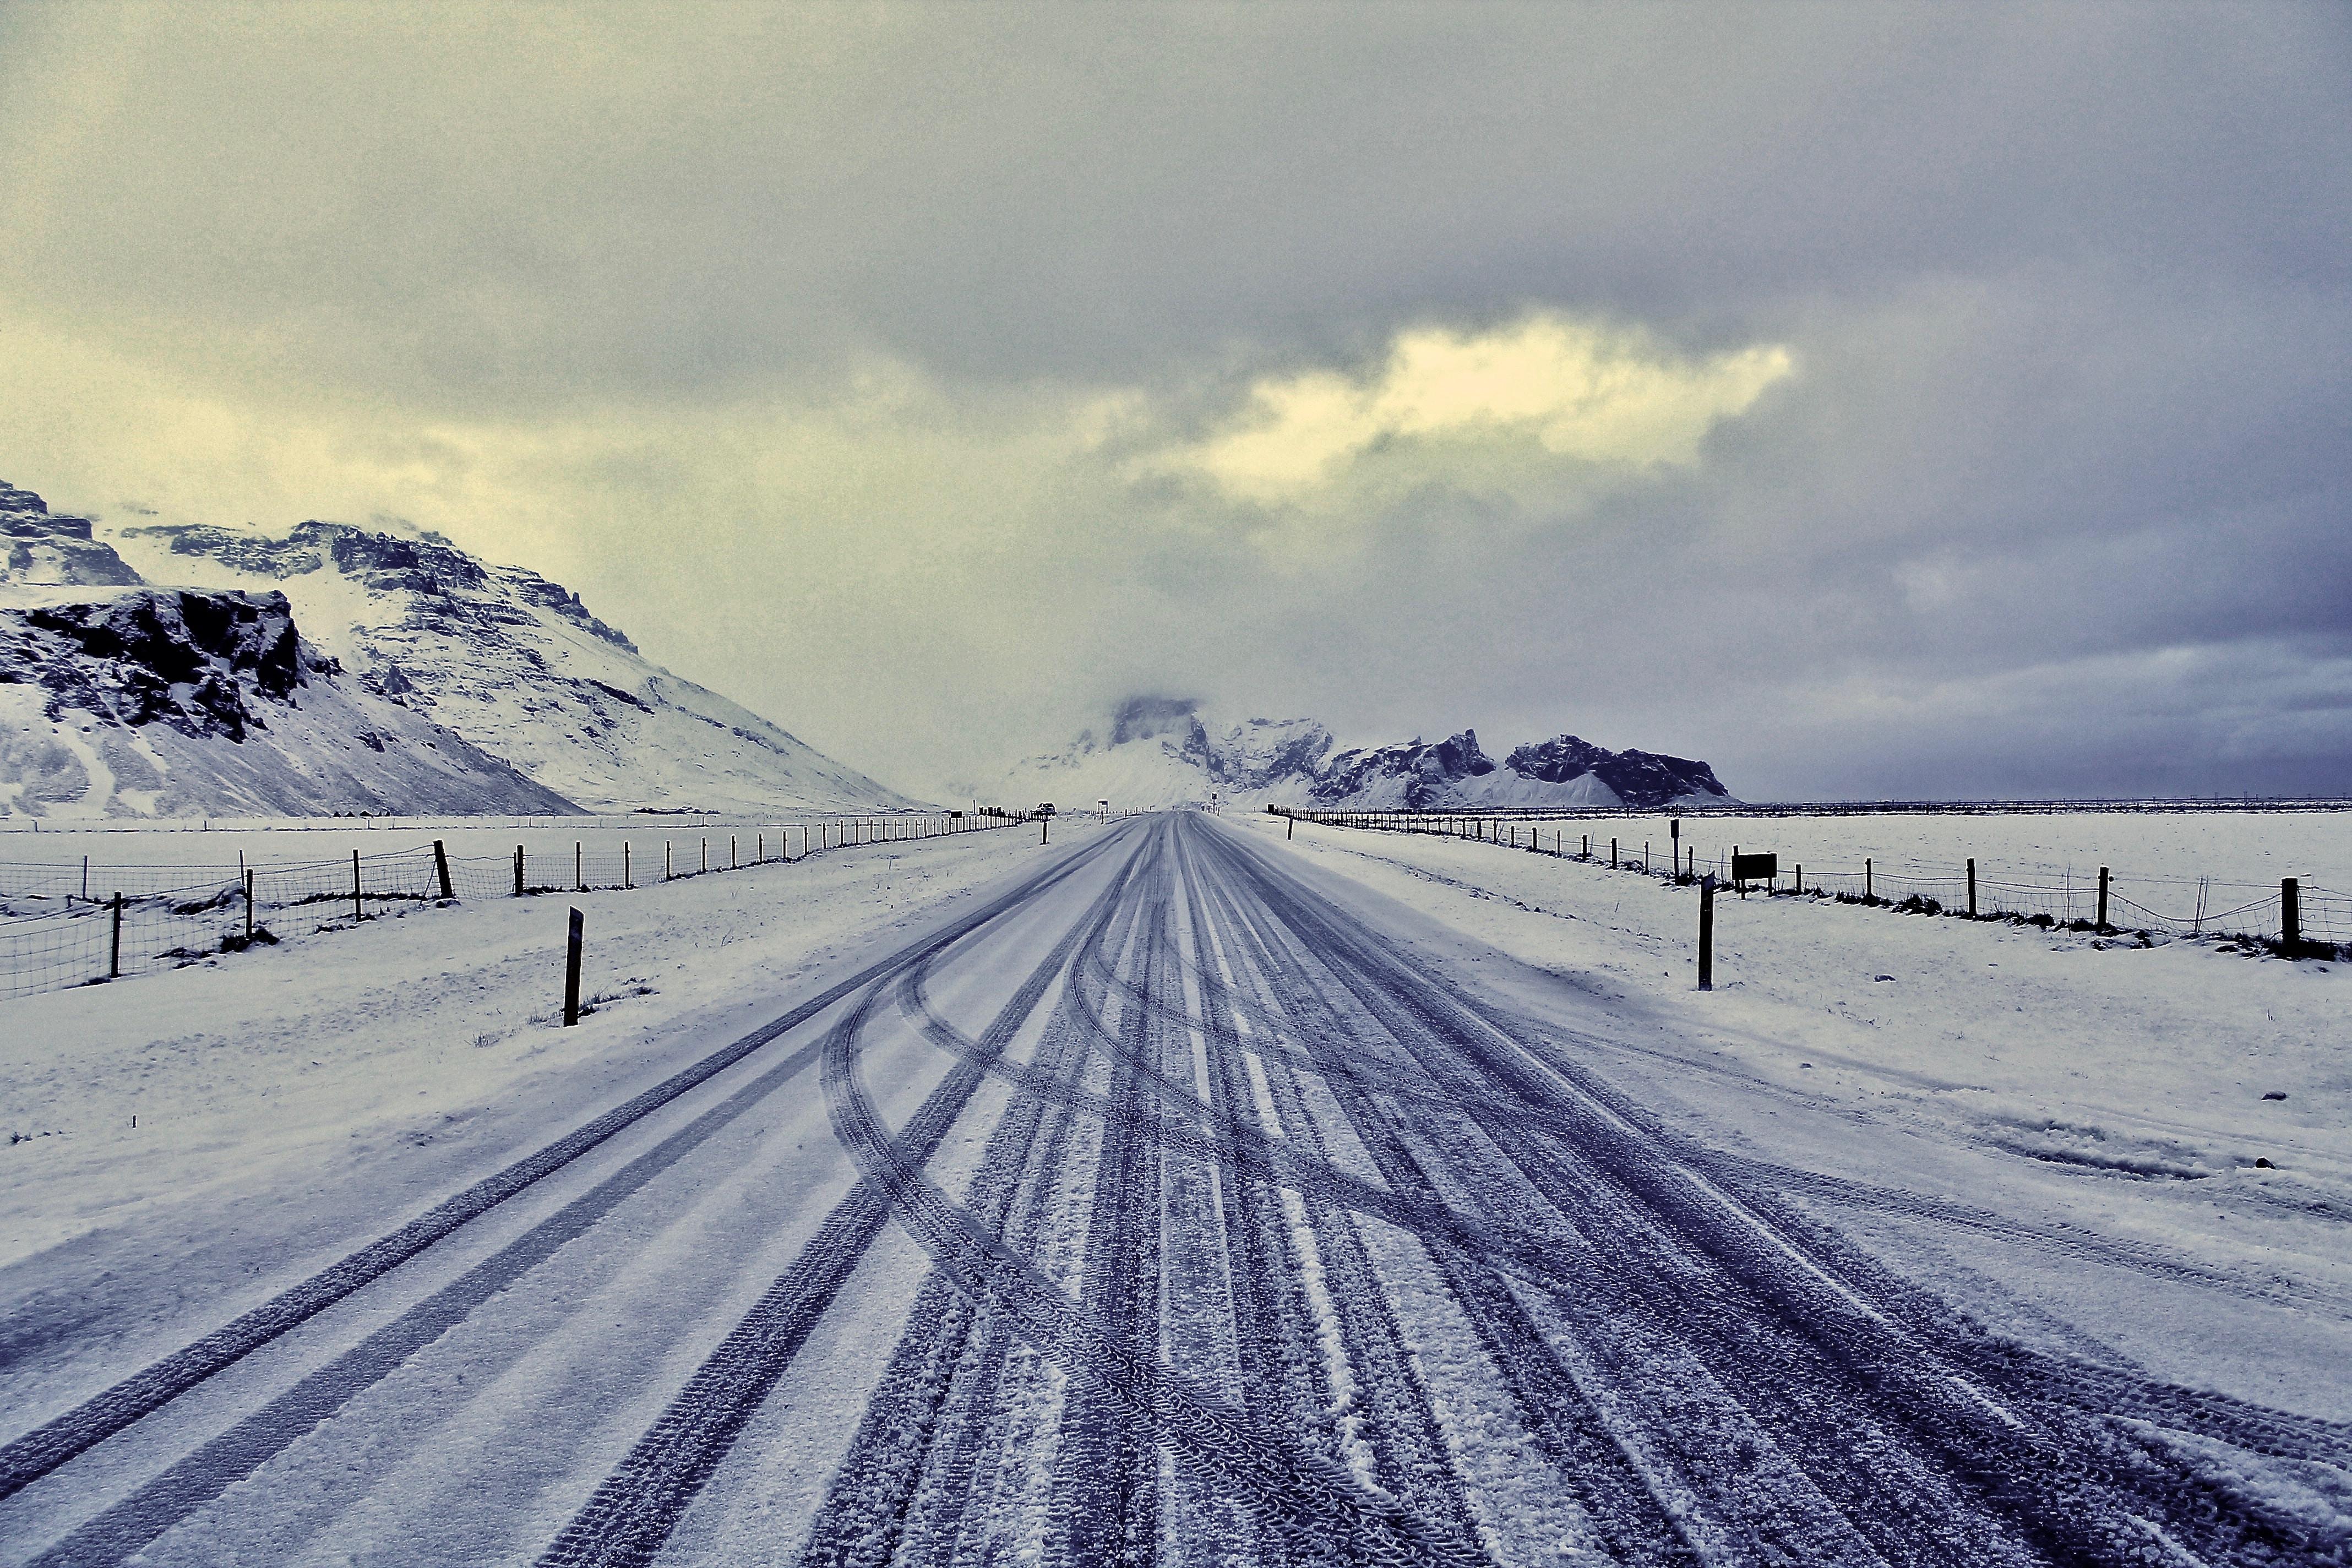 snow road with drift tire print near mountain range